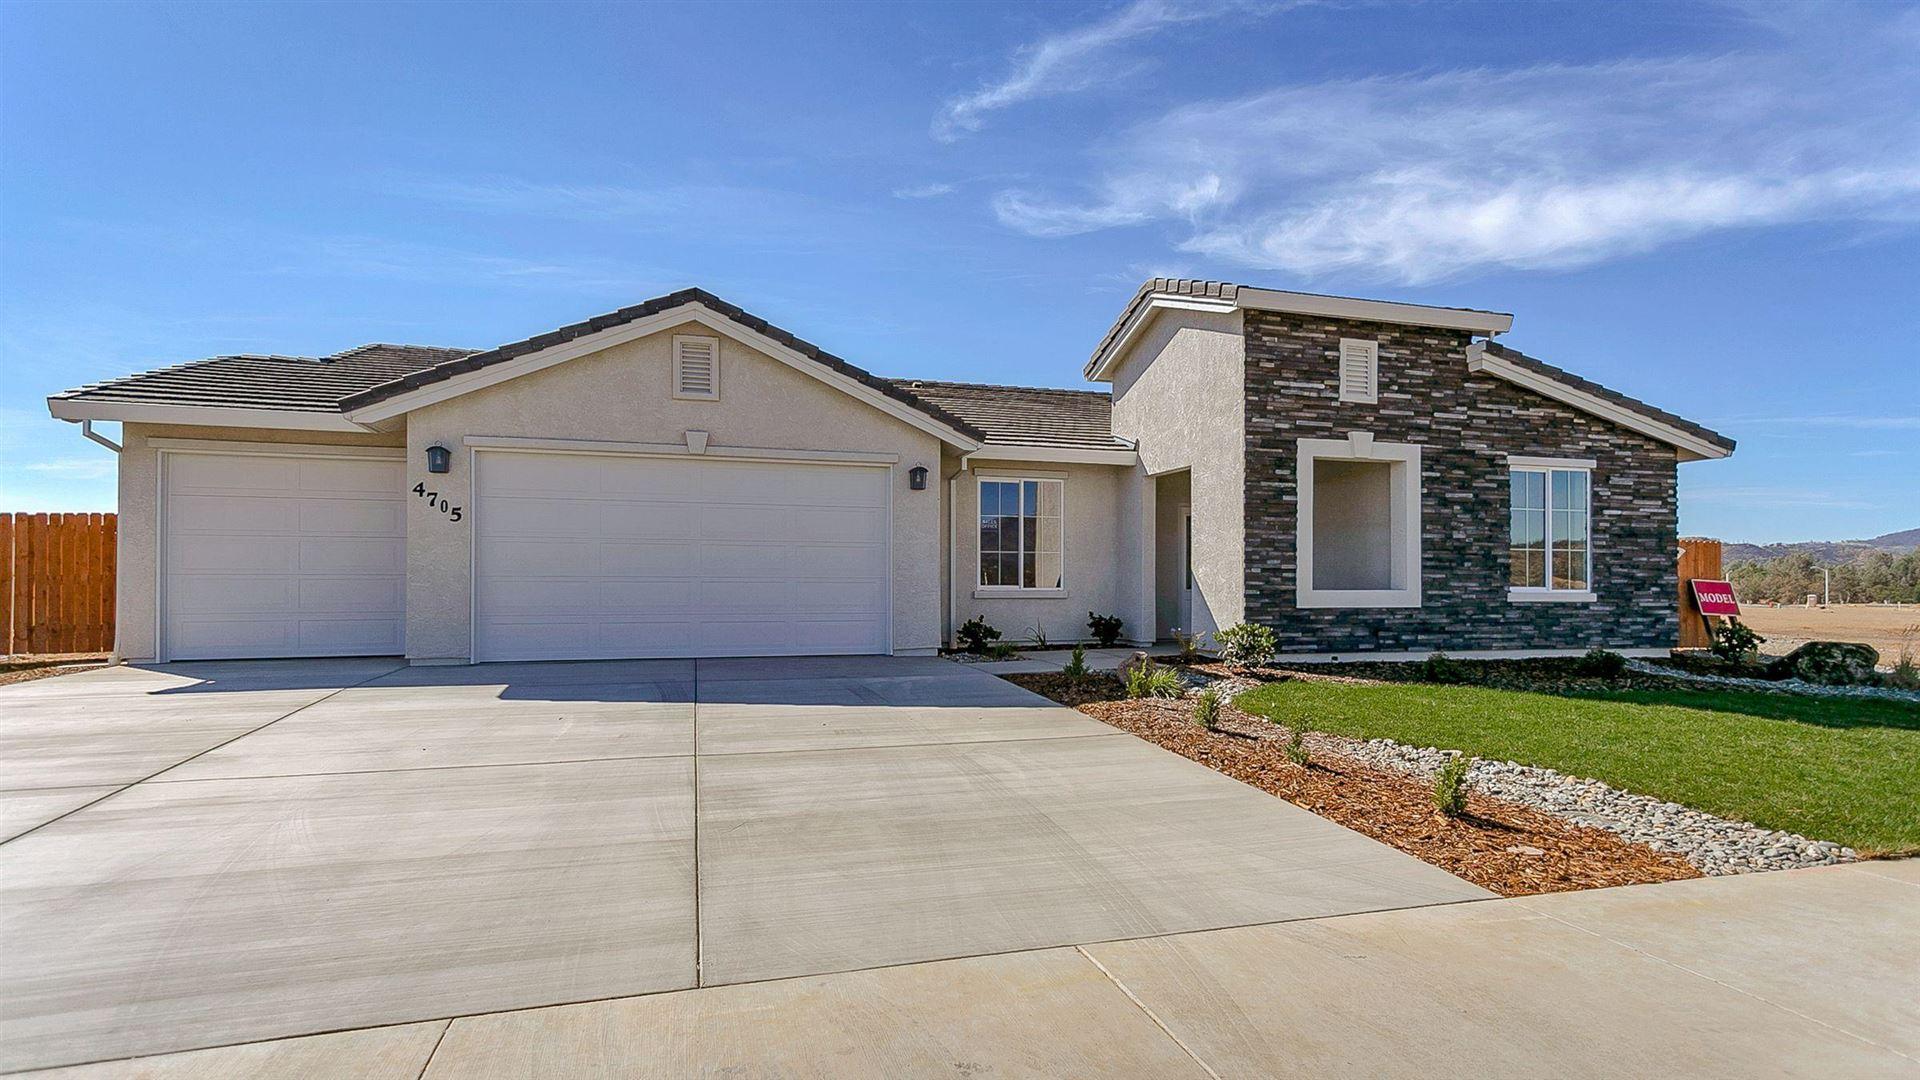 4705 Lower Springs Lot 7 Rd, Redding, CA 96001 - MLS#: 20-1909